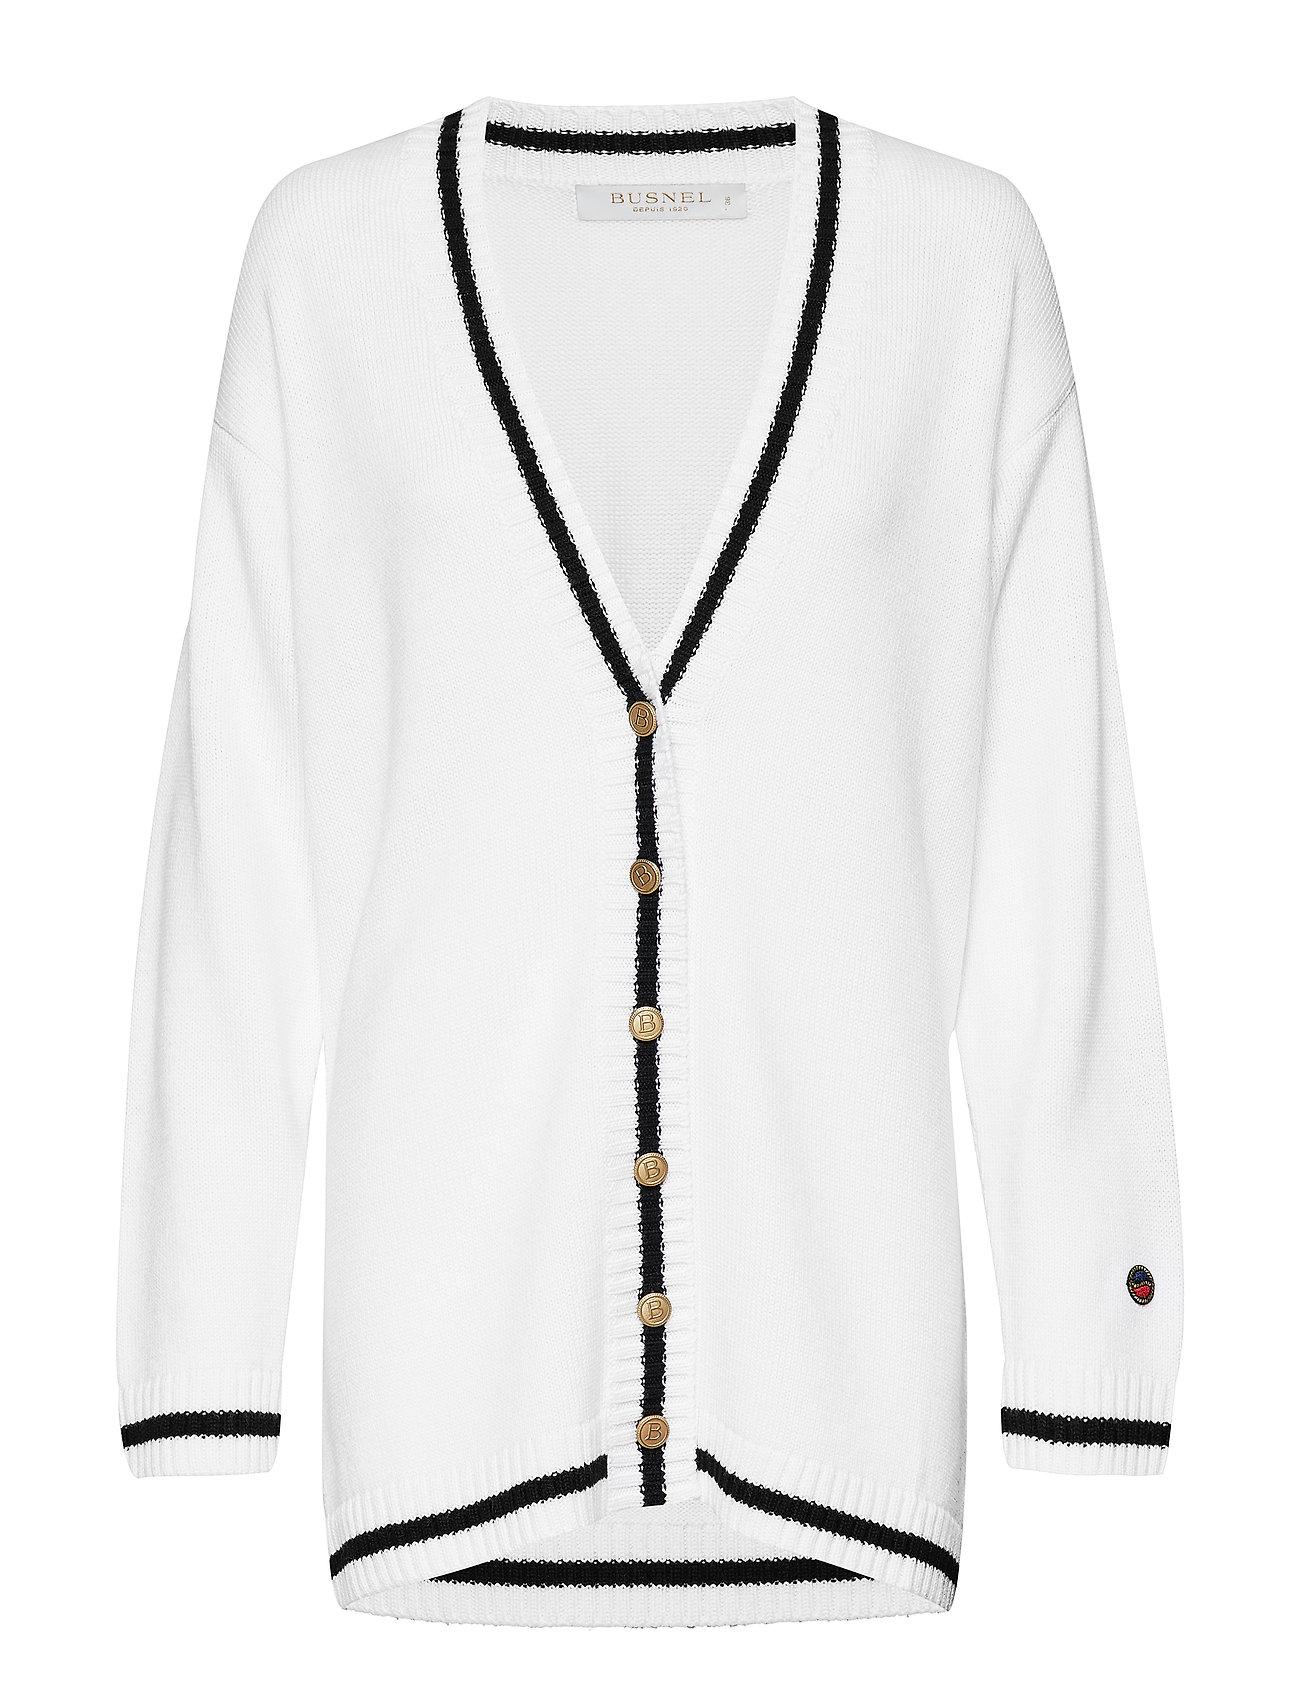 BUSNEL Parmentier cardigan - FOAM WHITE WITH BLACK LINE